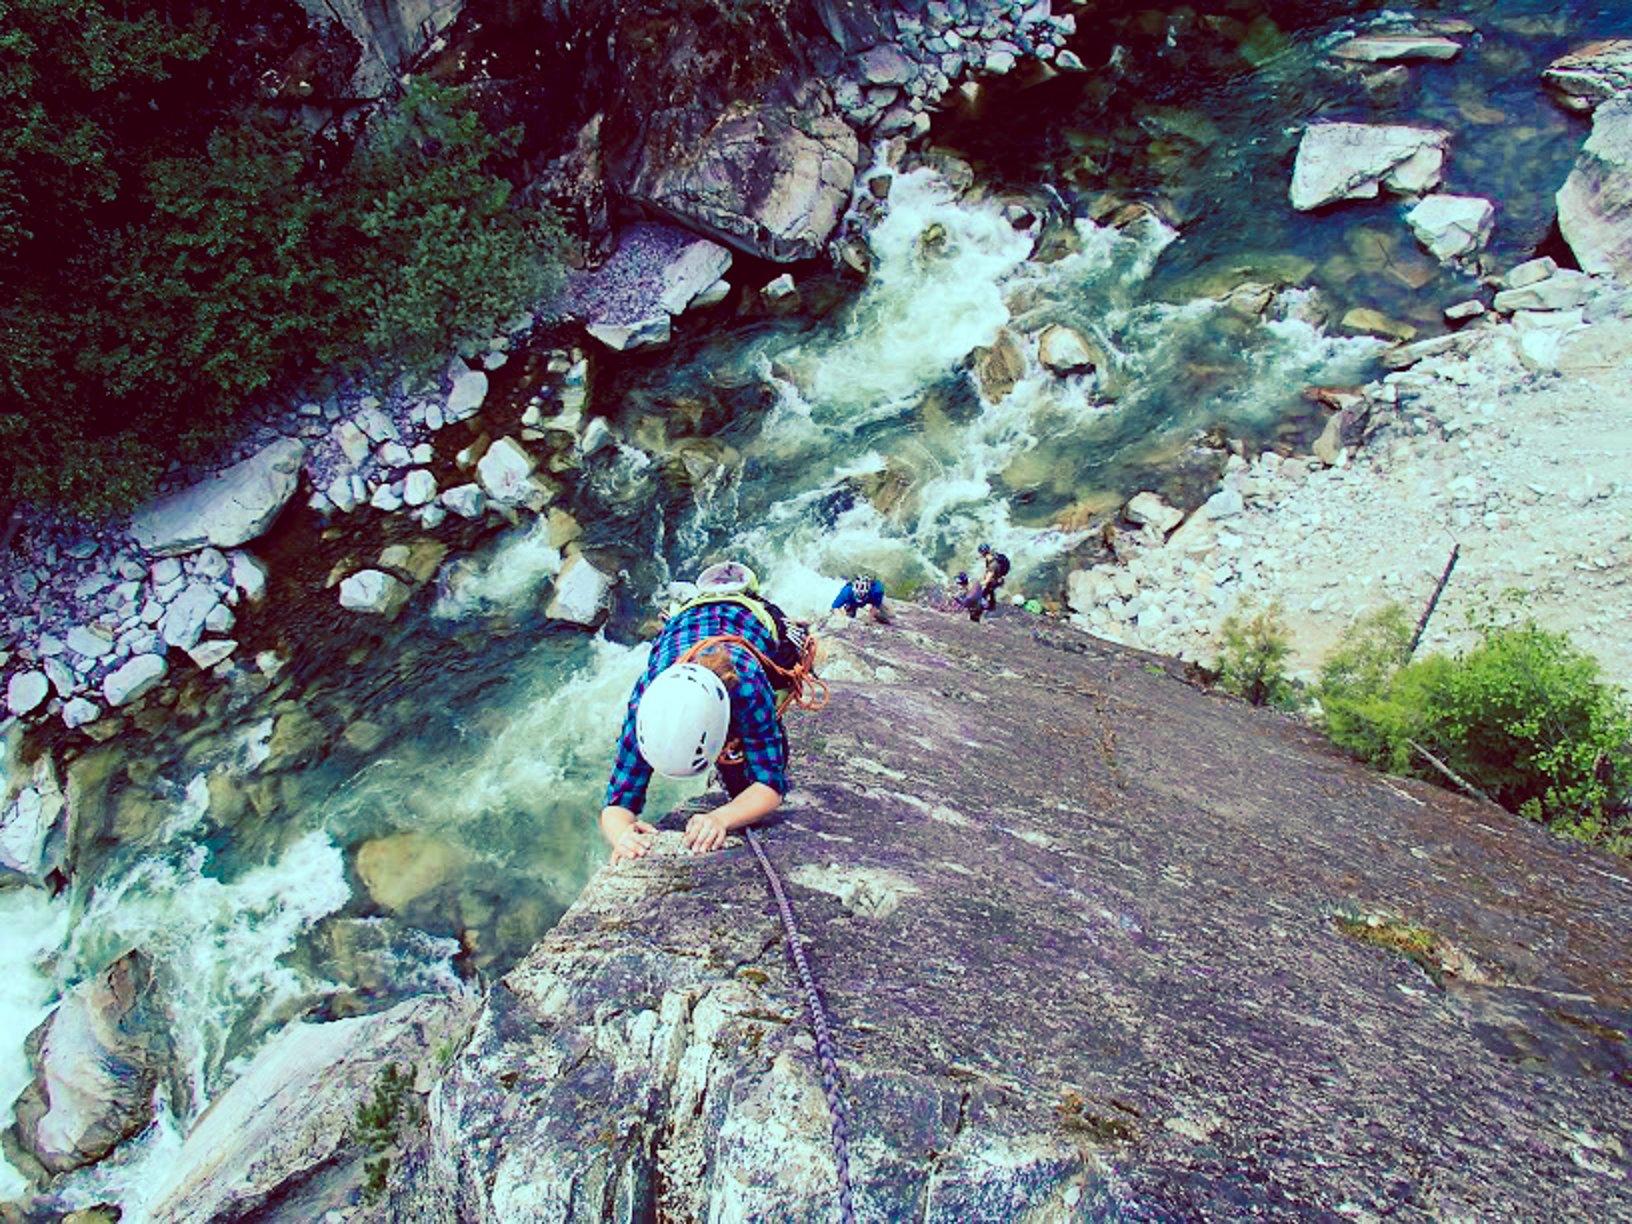 May_Rock_Climbing_(6_of_6).jpg